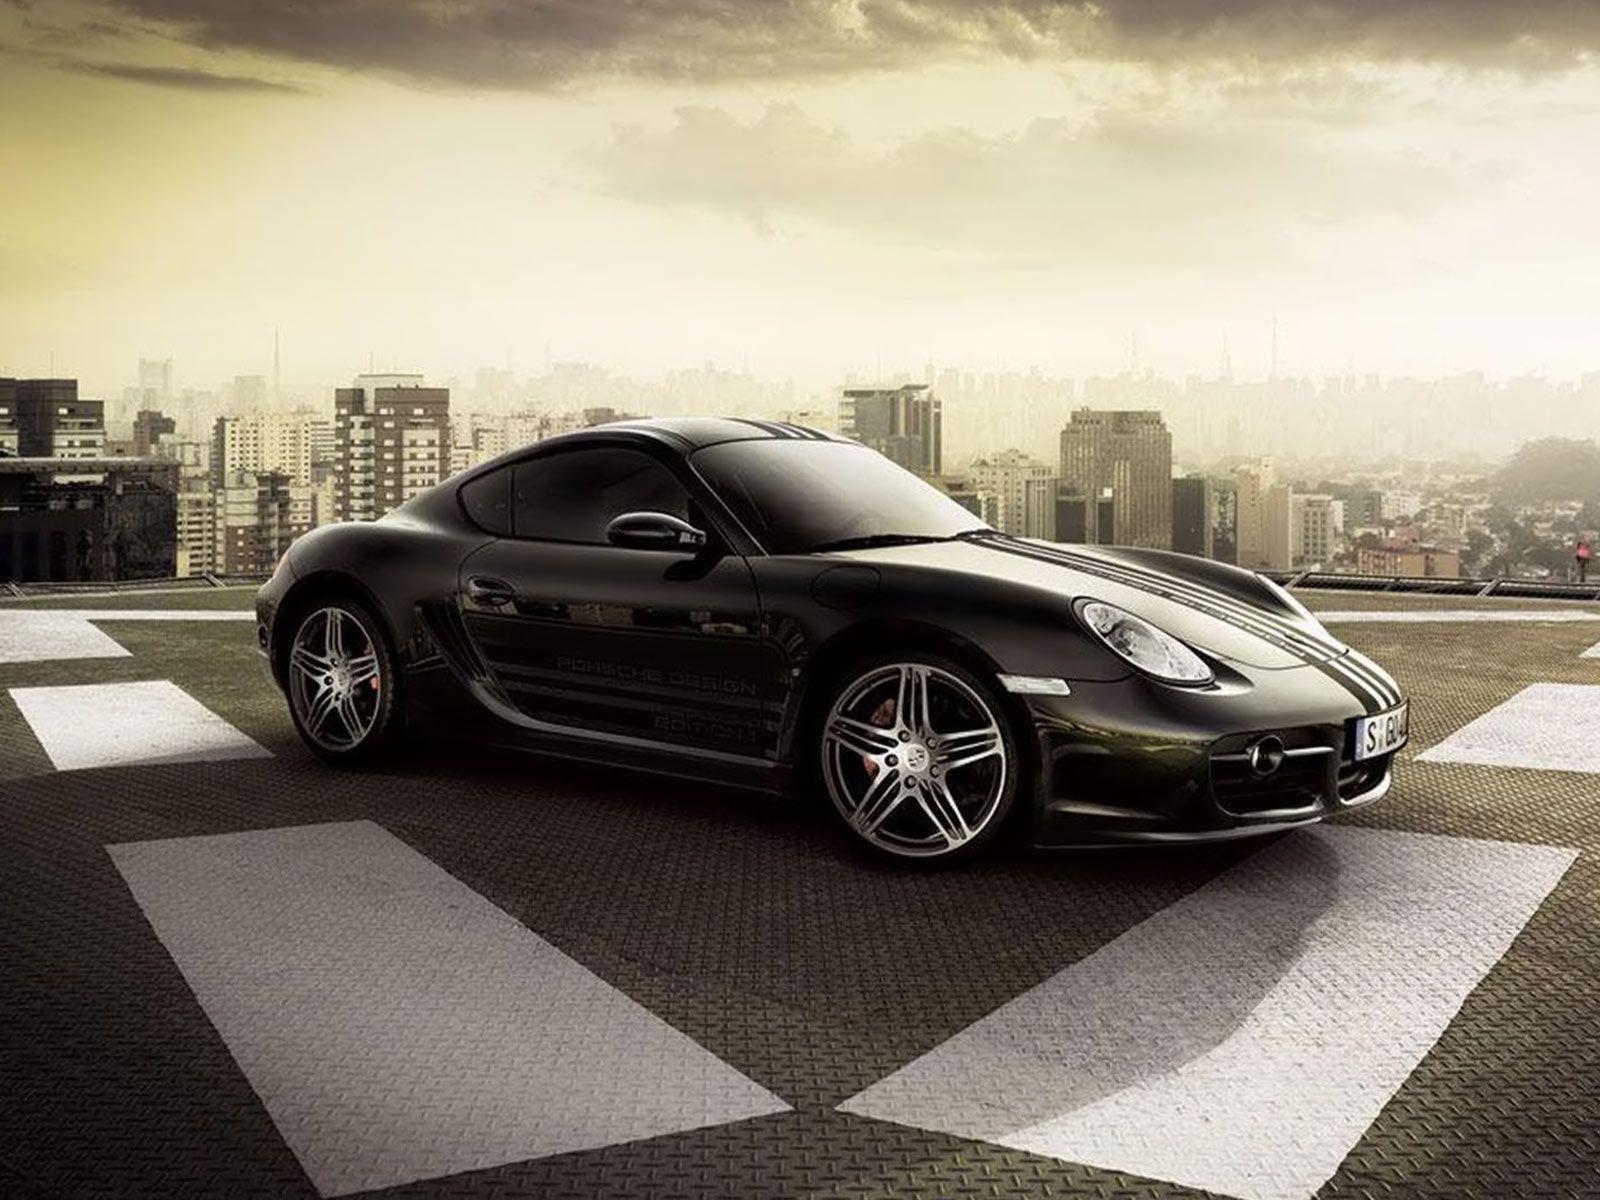 desktop wallpaper motors cars porsche cars free background